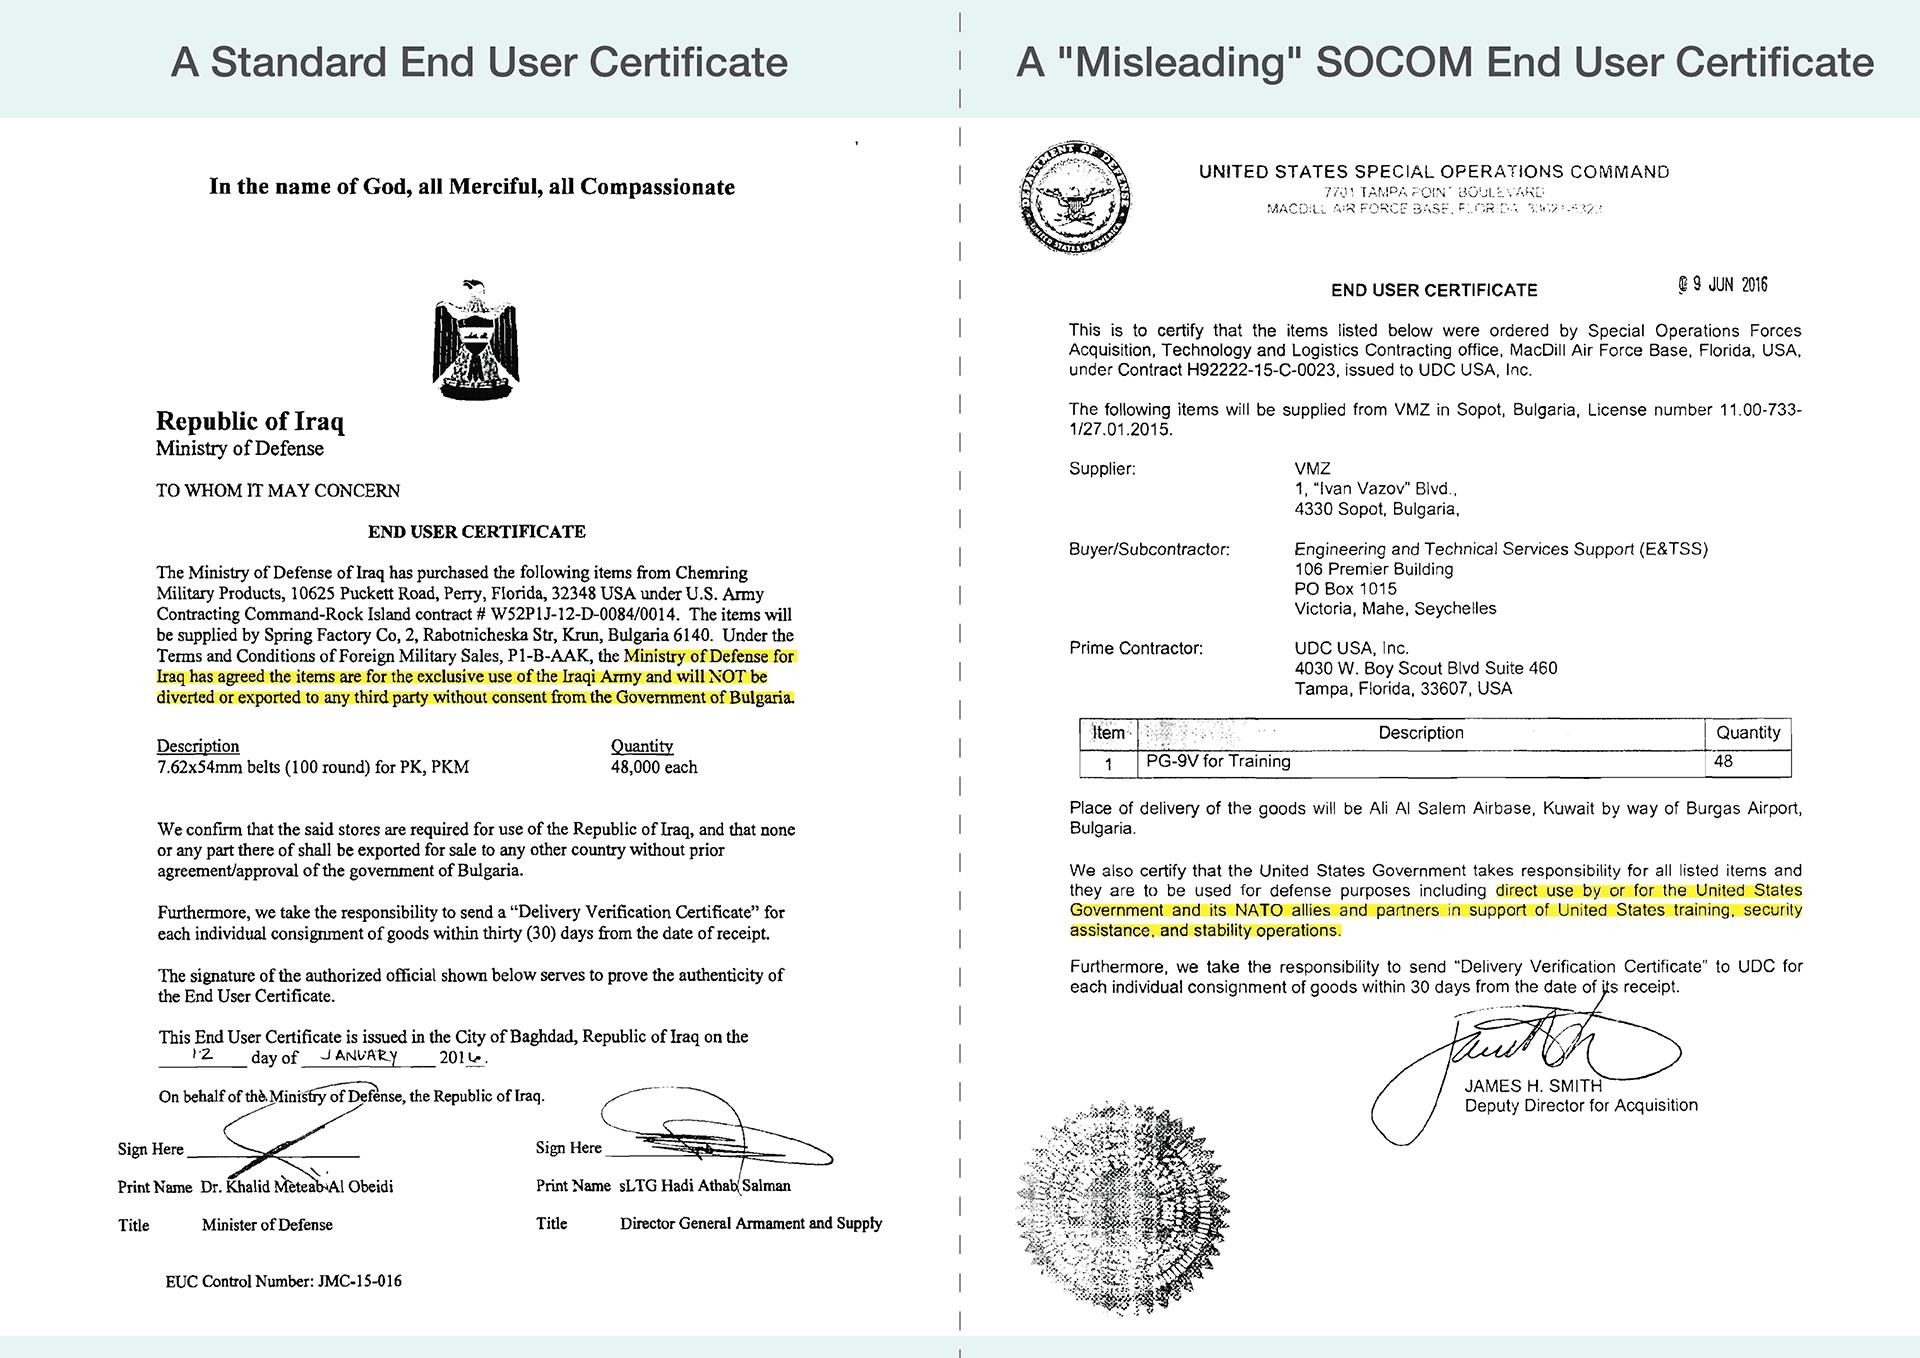 makingakilling/SOCOM-certificate.png